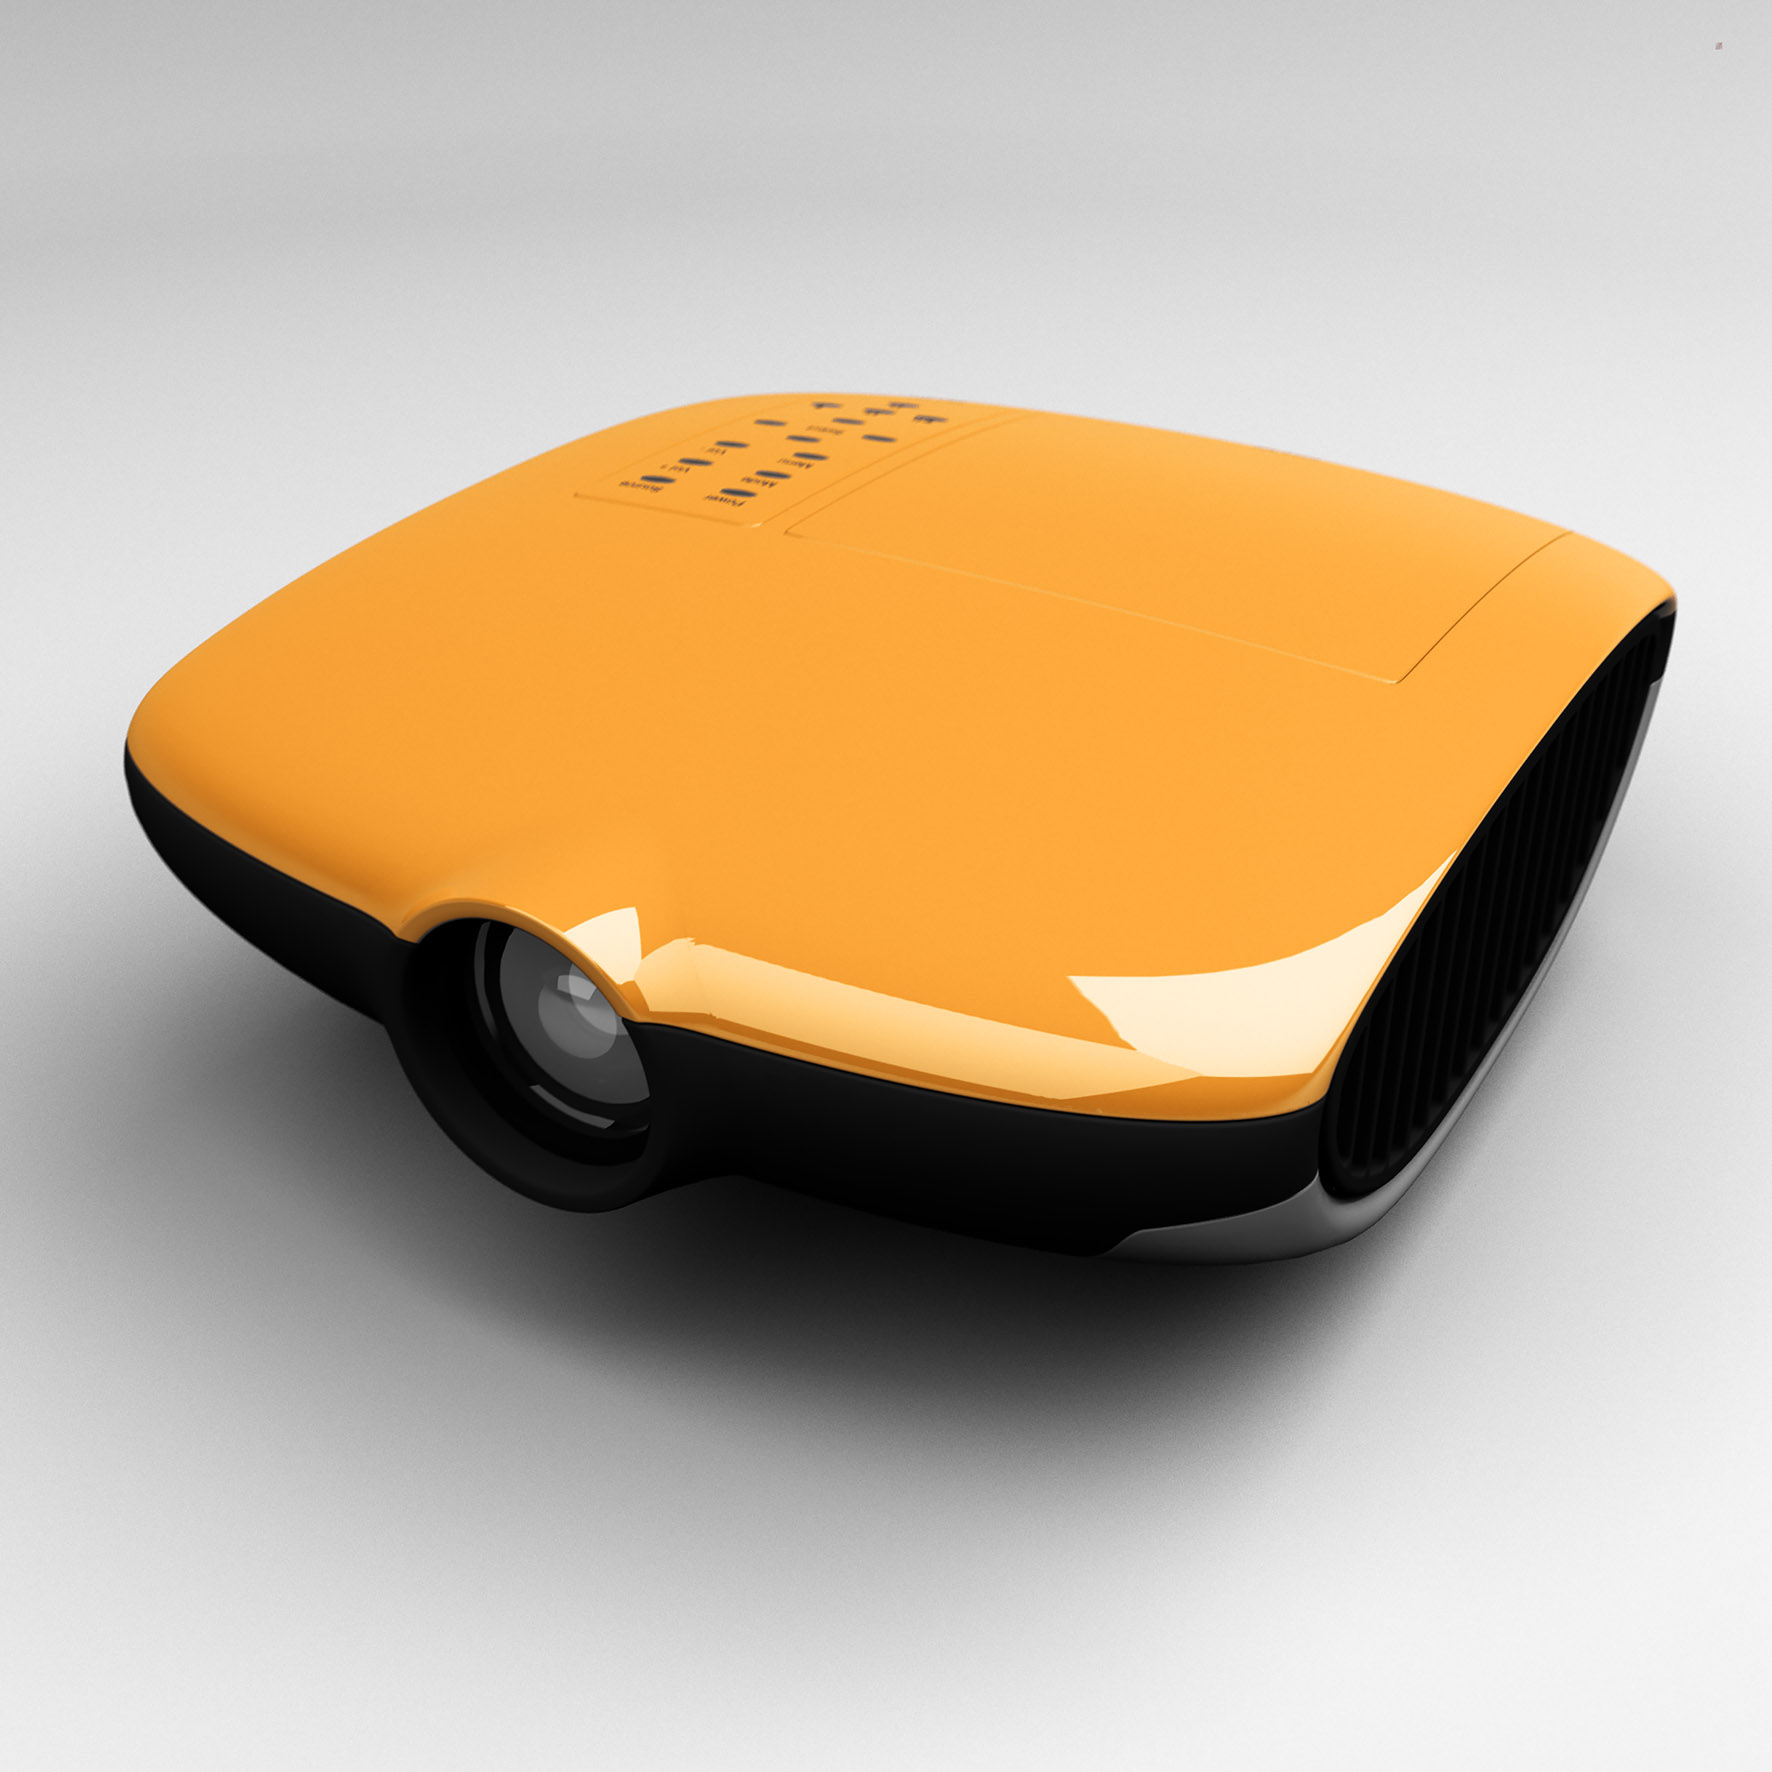 002-big-bez-jackovaimage-orange-2